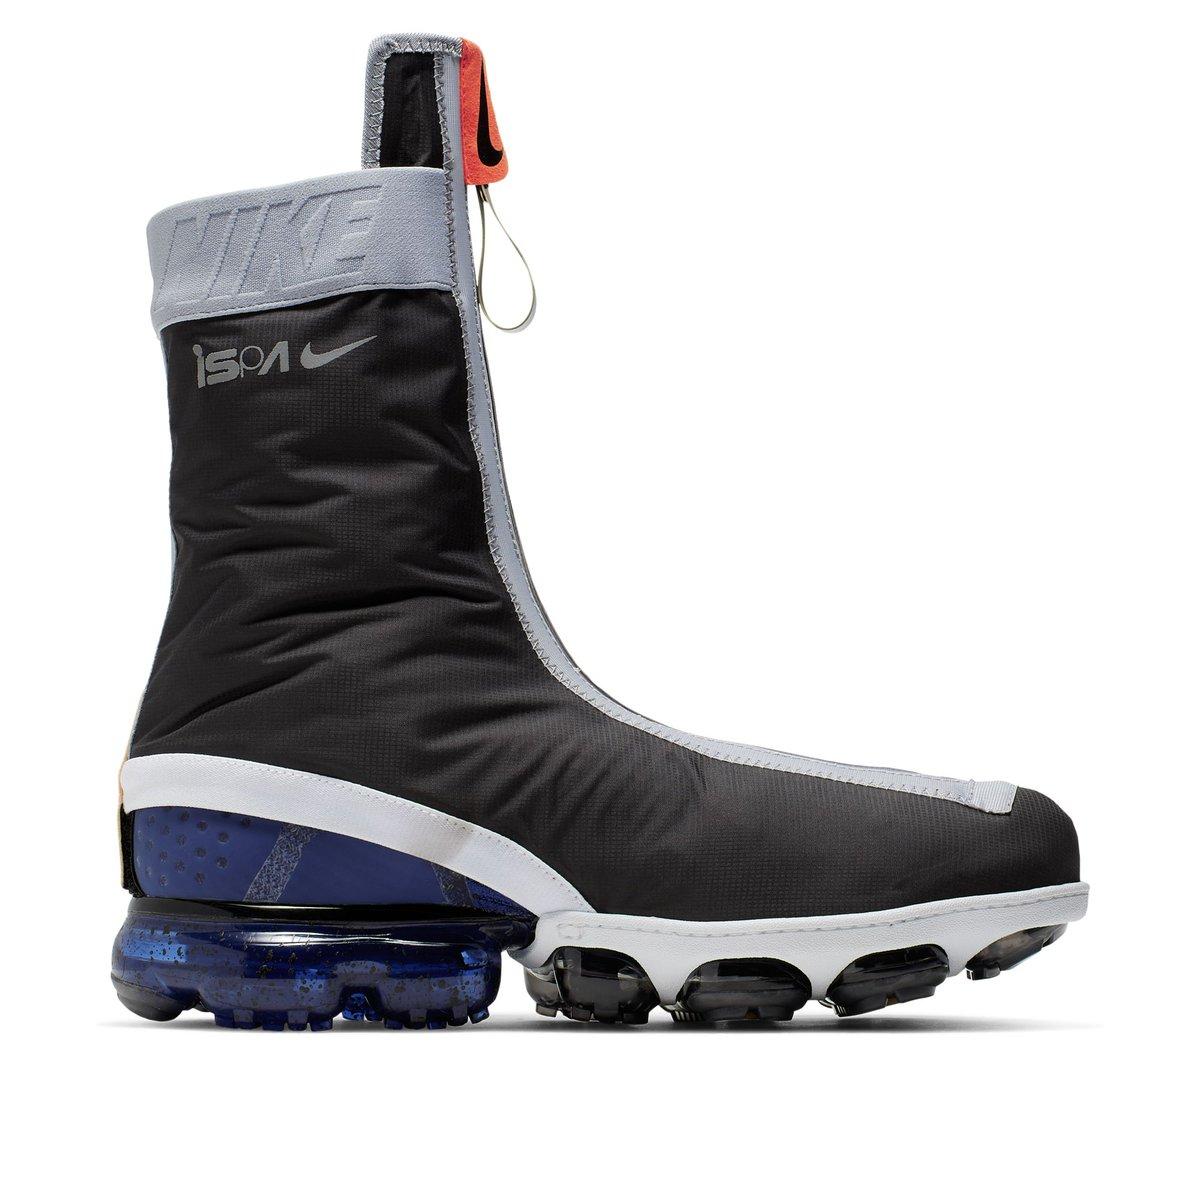 Nike,ISPA,发售,Air VaporMax Flyk  重新定义「机能球鞋」!这双 Nike ISPA 新作也太前卫了!